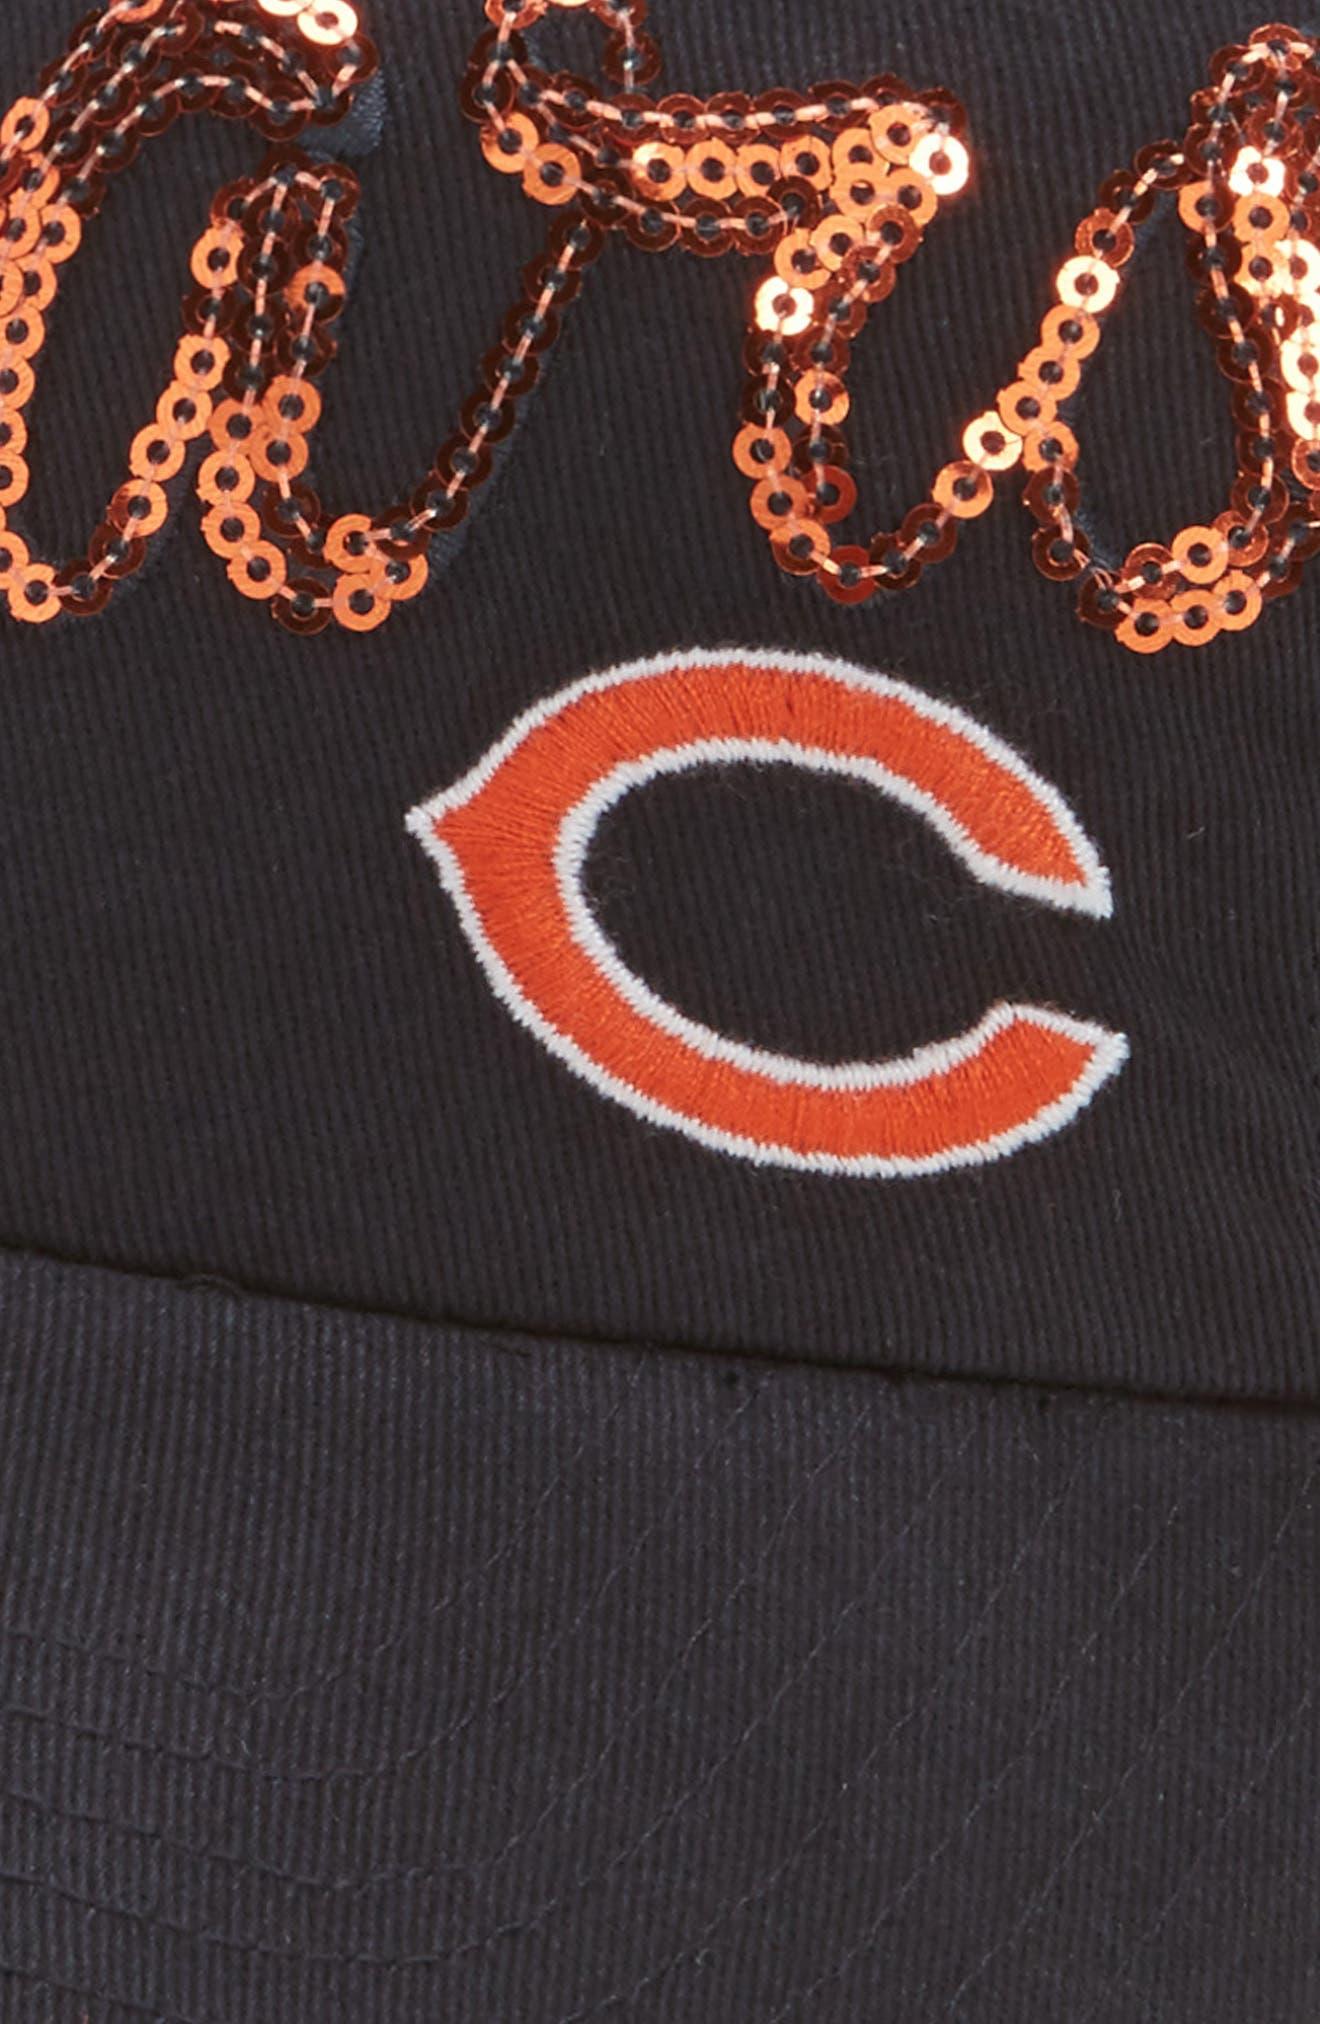 Chicago Bears Sparkle Cap,                             Alternate thumbnail 3, color,                             Navy